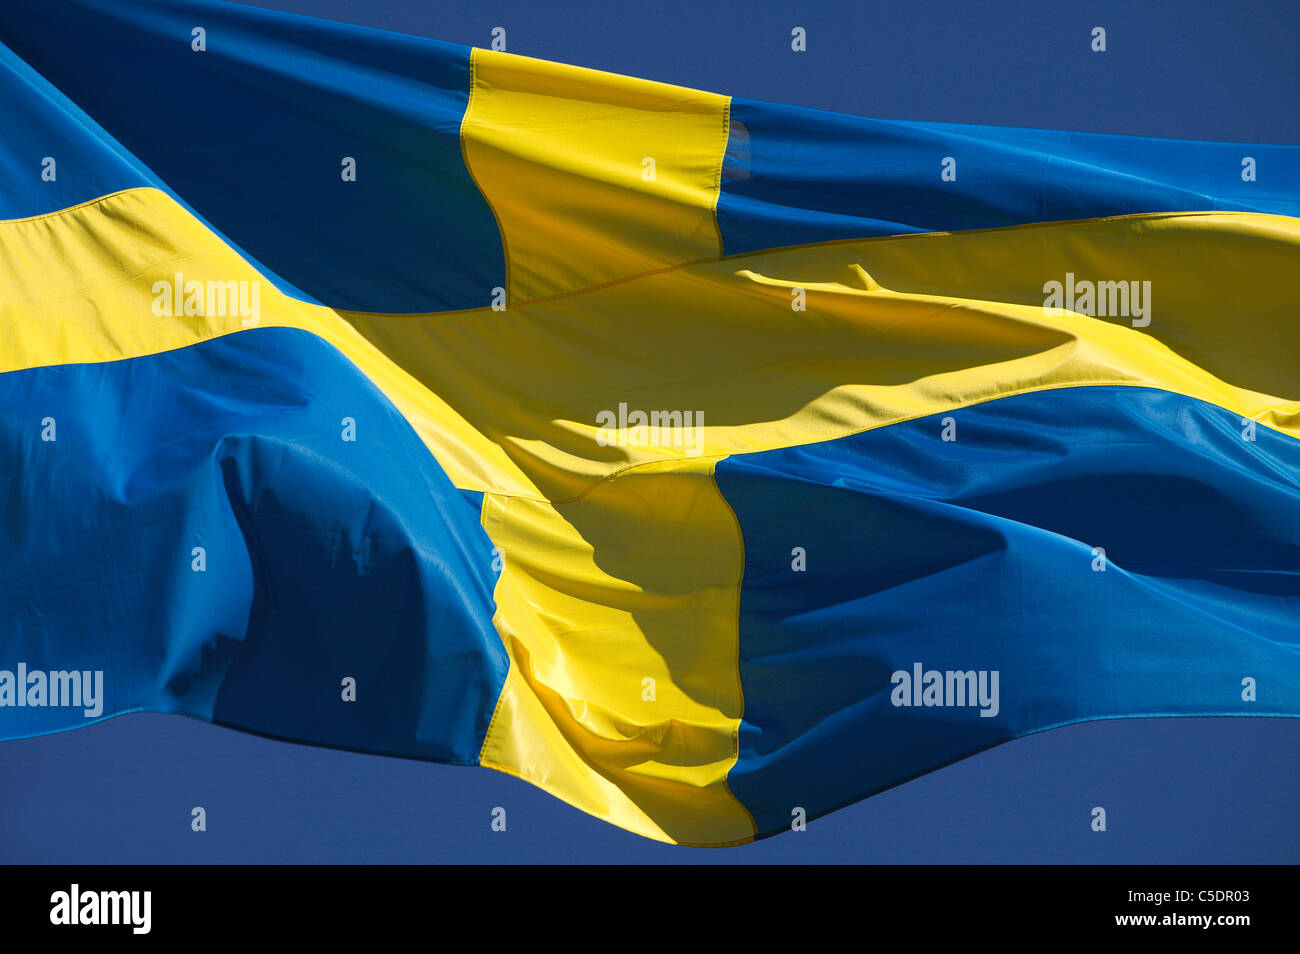 Detail shot of fluttering Swedish flag - Stock Image